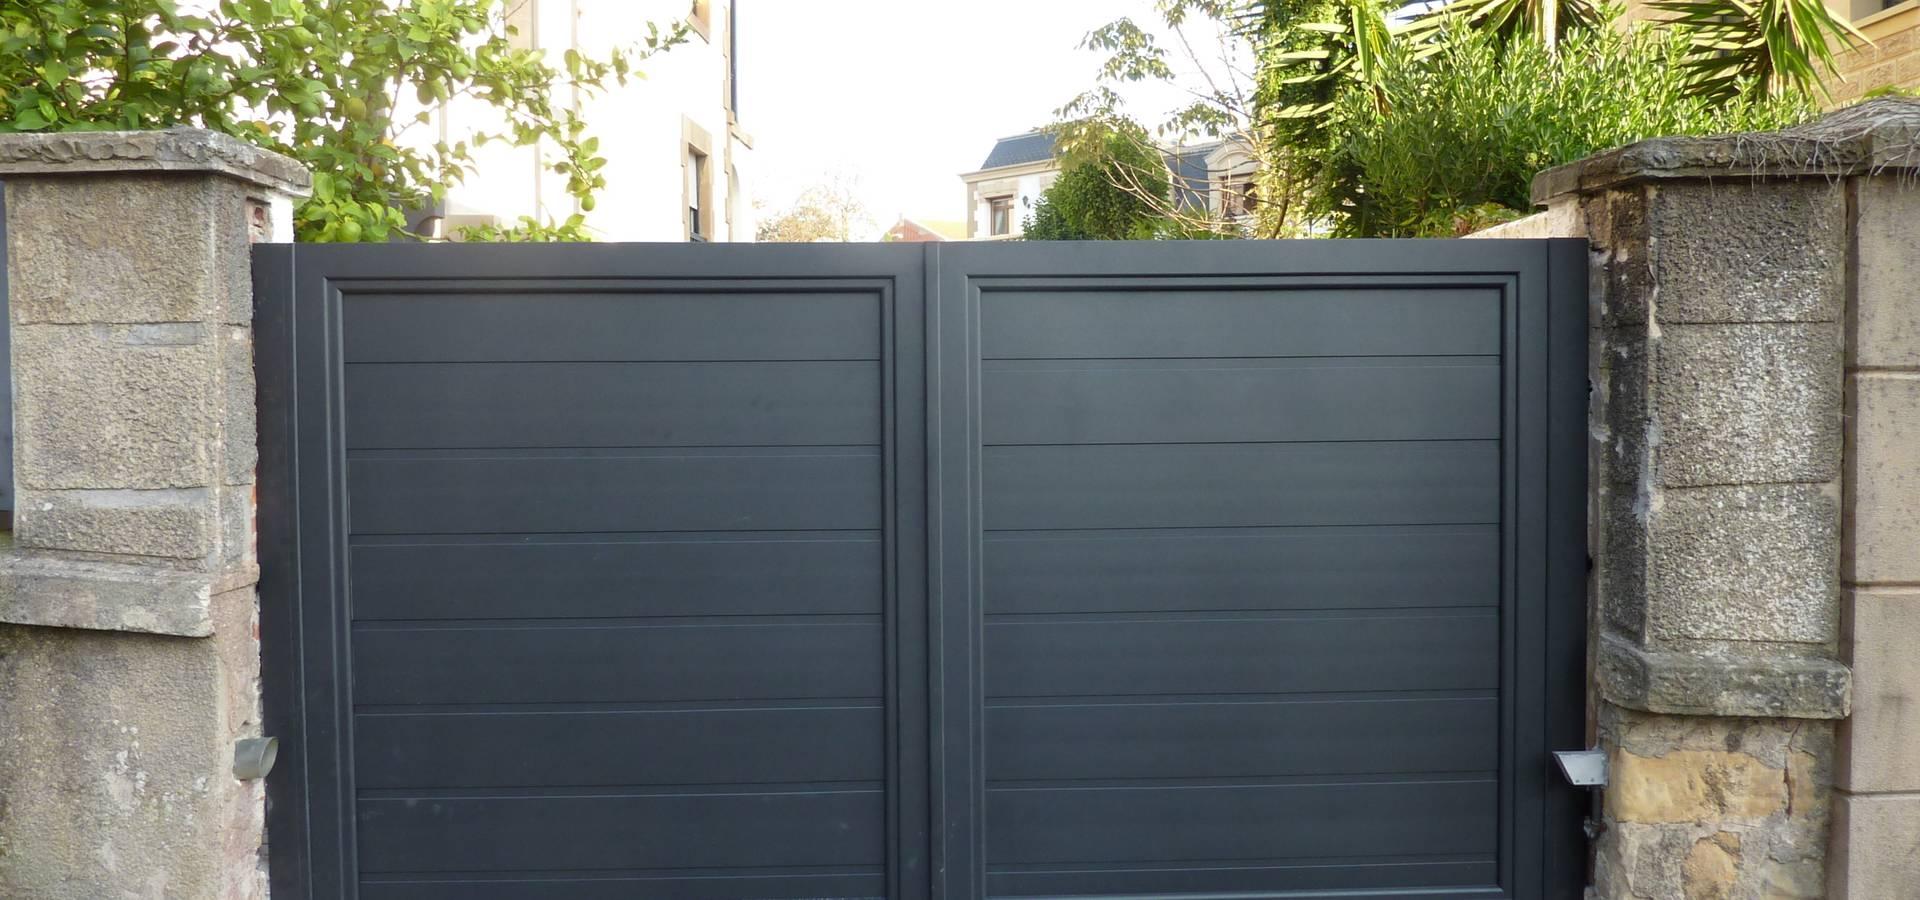 Puertas Lorenzo, s.a